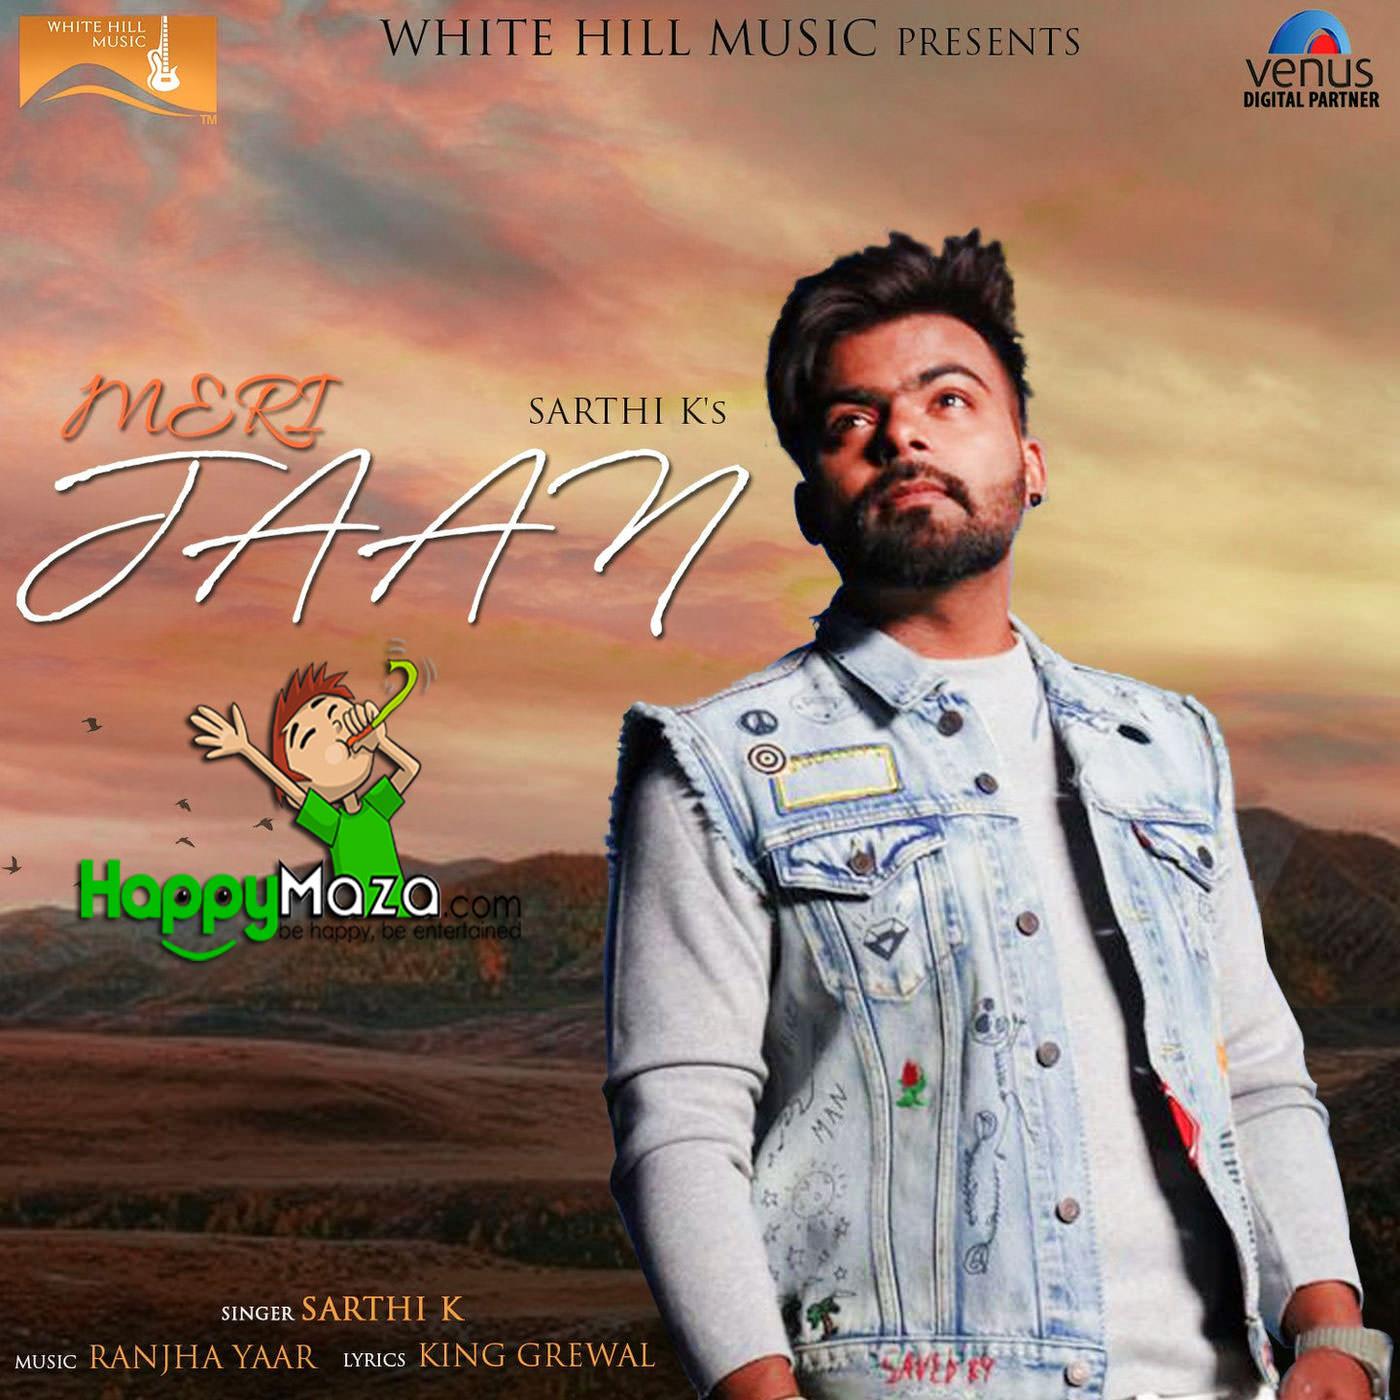 Tere Yaar Bathere Ne: Meri Jaan Lyrics - Sarthi K - 2017